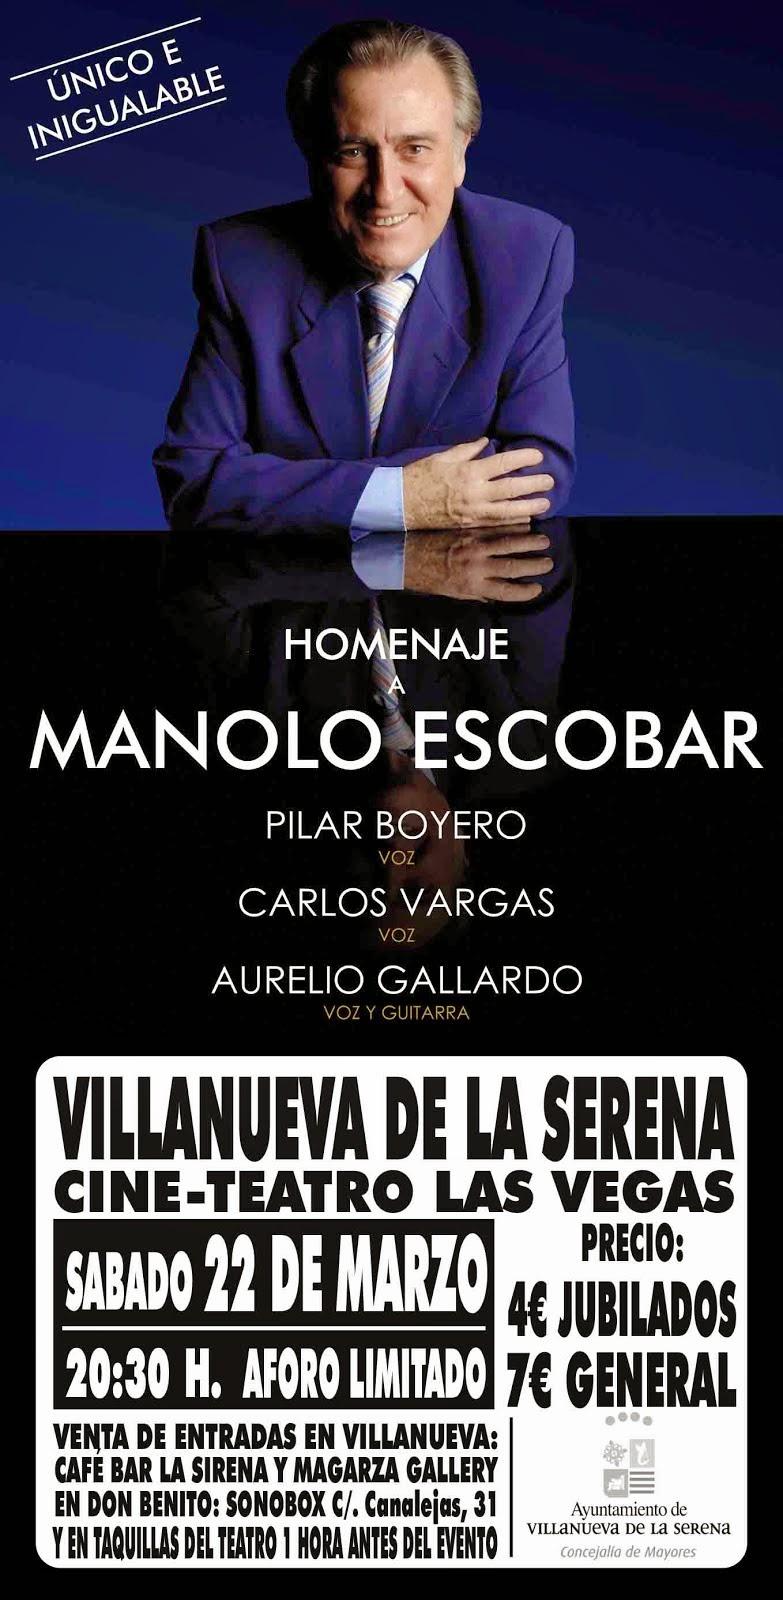 Homenaje a Manolo Escobar